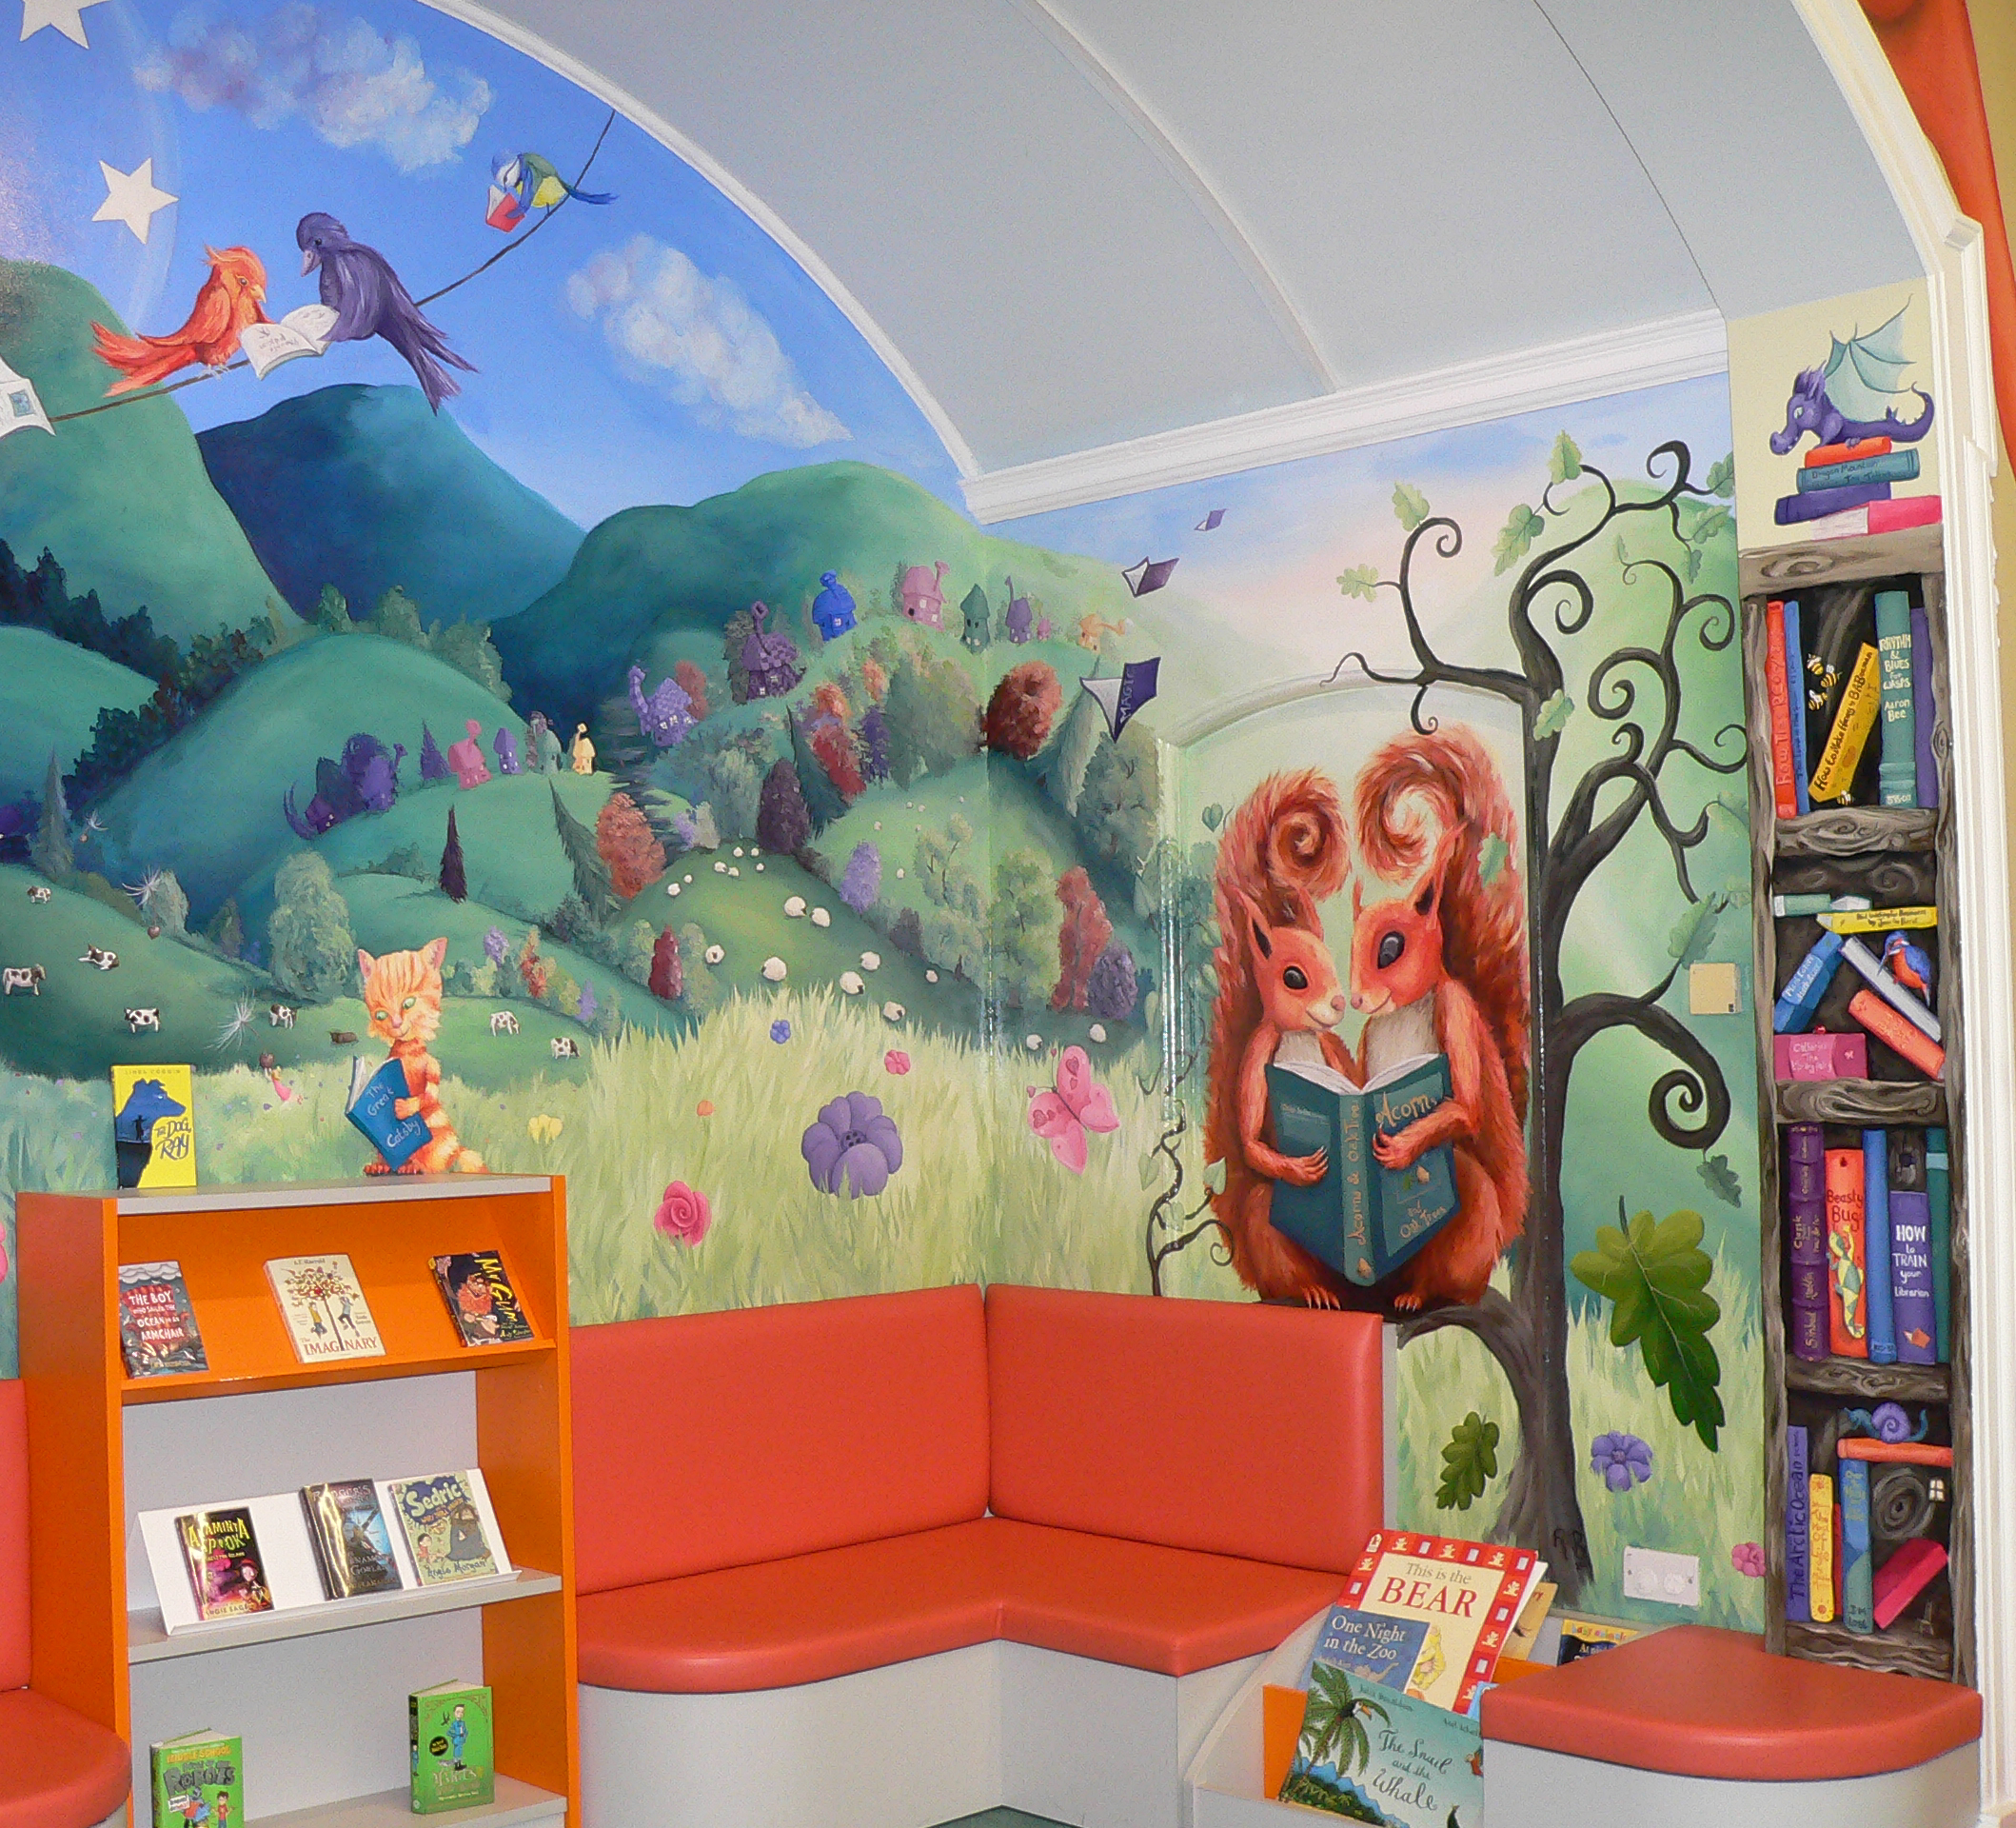 Malvern Library Mural